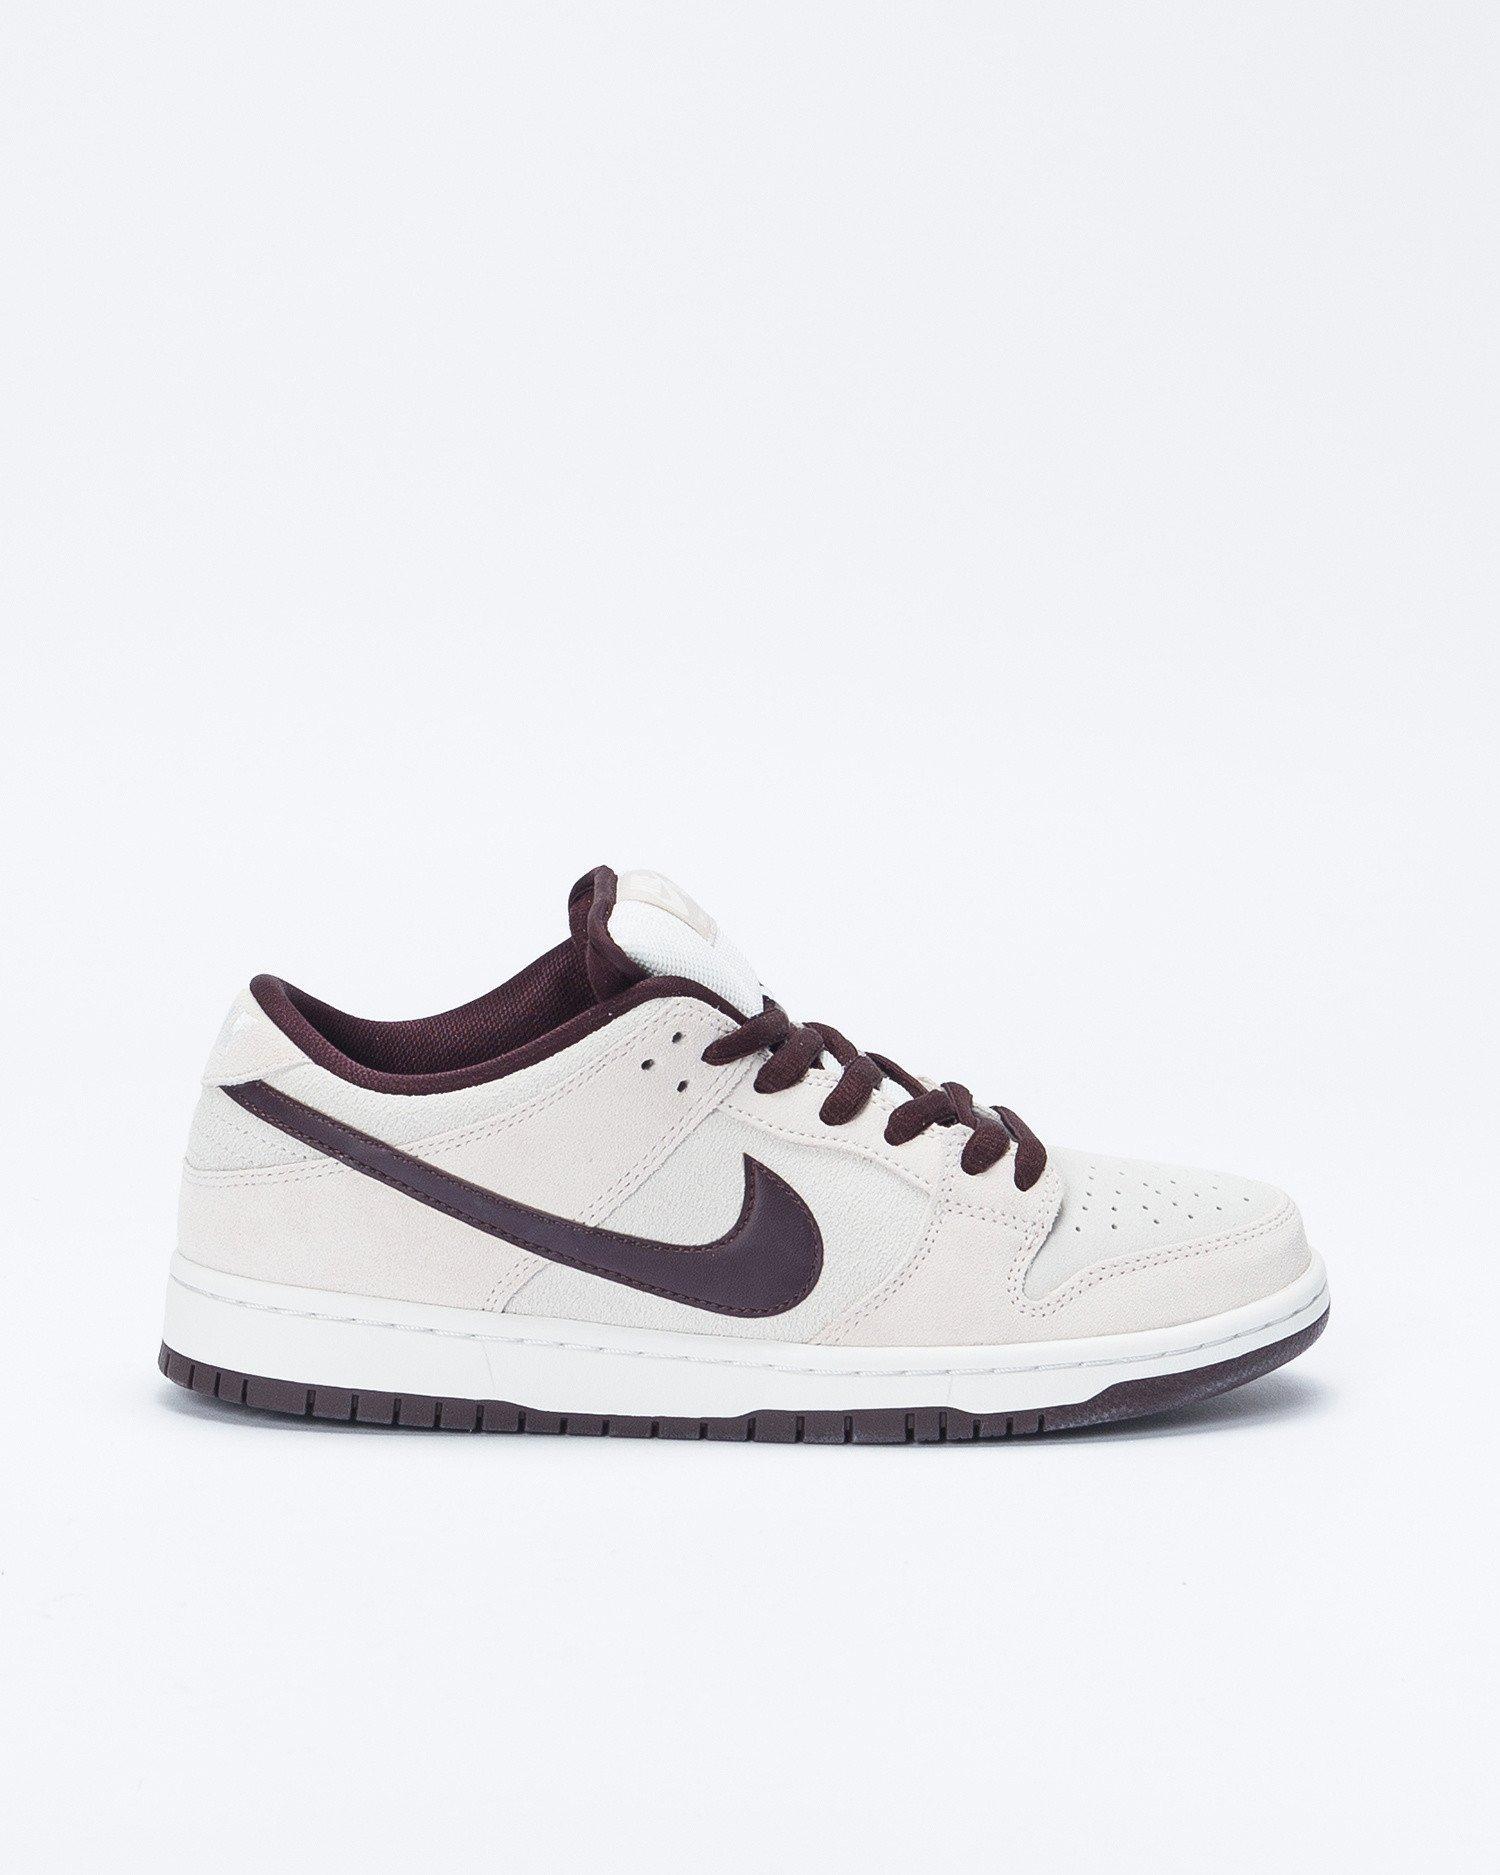 best service 0e2f0 8c3b5 Nike SB Nike SB Dunk Low Pro Desert Sand/Mahogany-Summit White